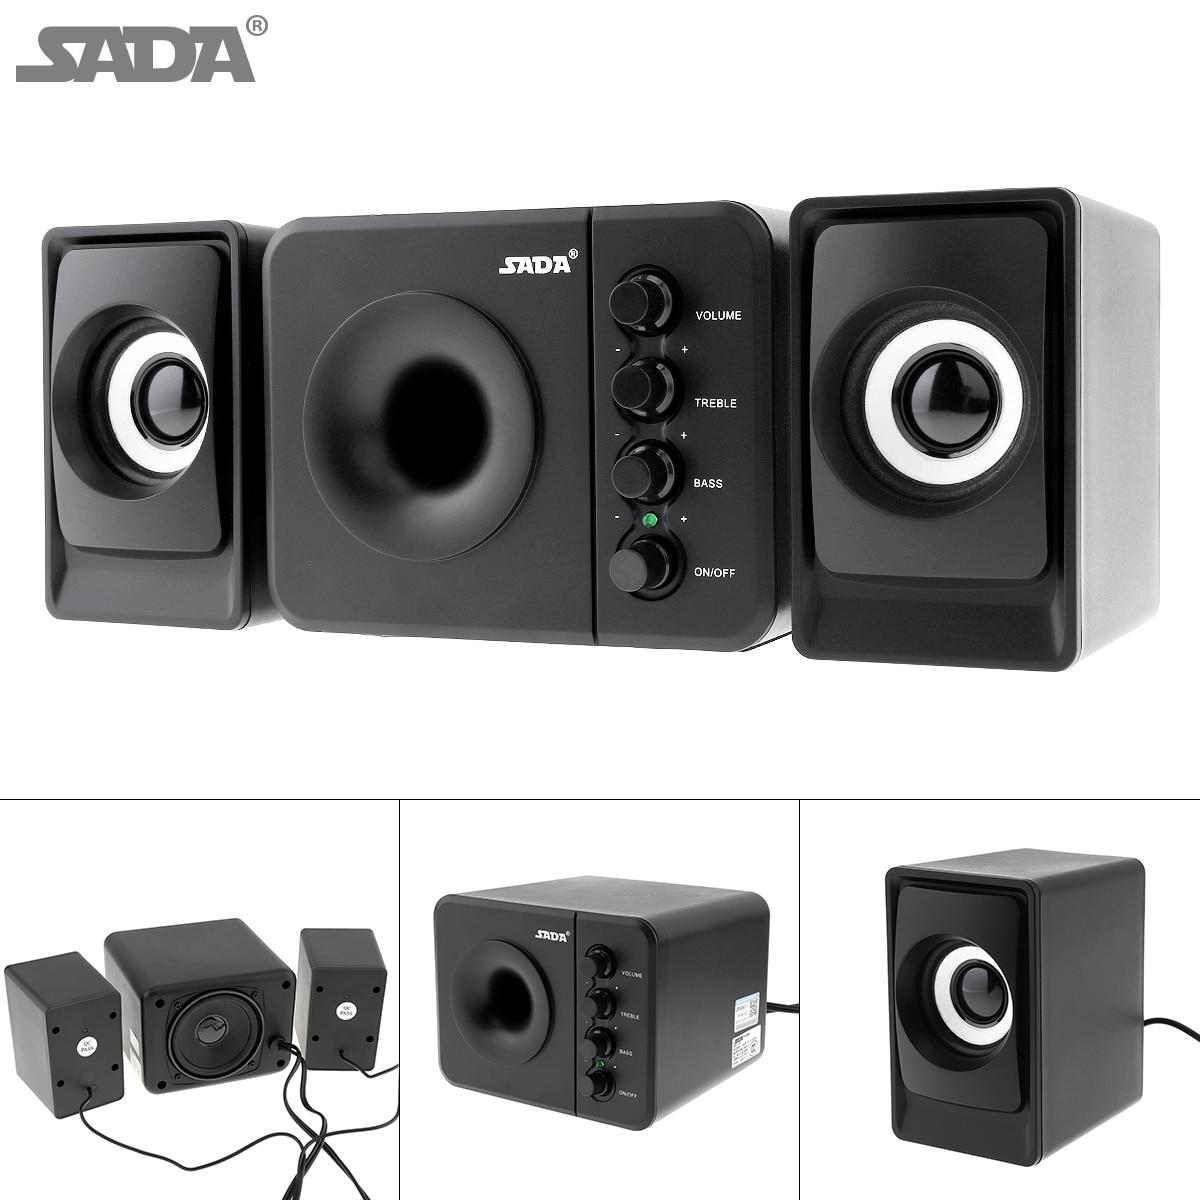 SADA 2018 Newest full Range 3D Stereo Subwoofer 100% Bass PC Speaker Portable Music DJ USB Computer Speakers For laptop Phone TV